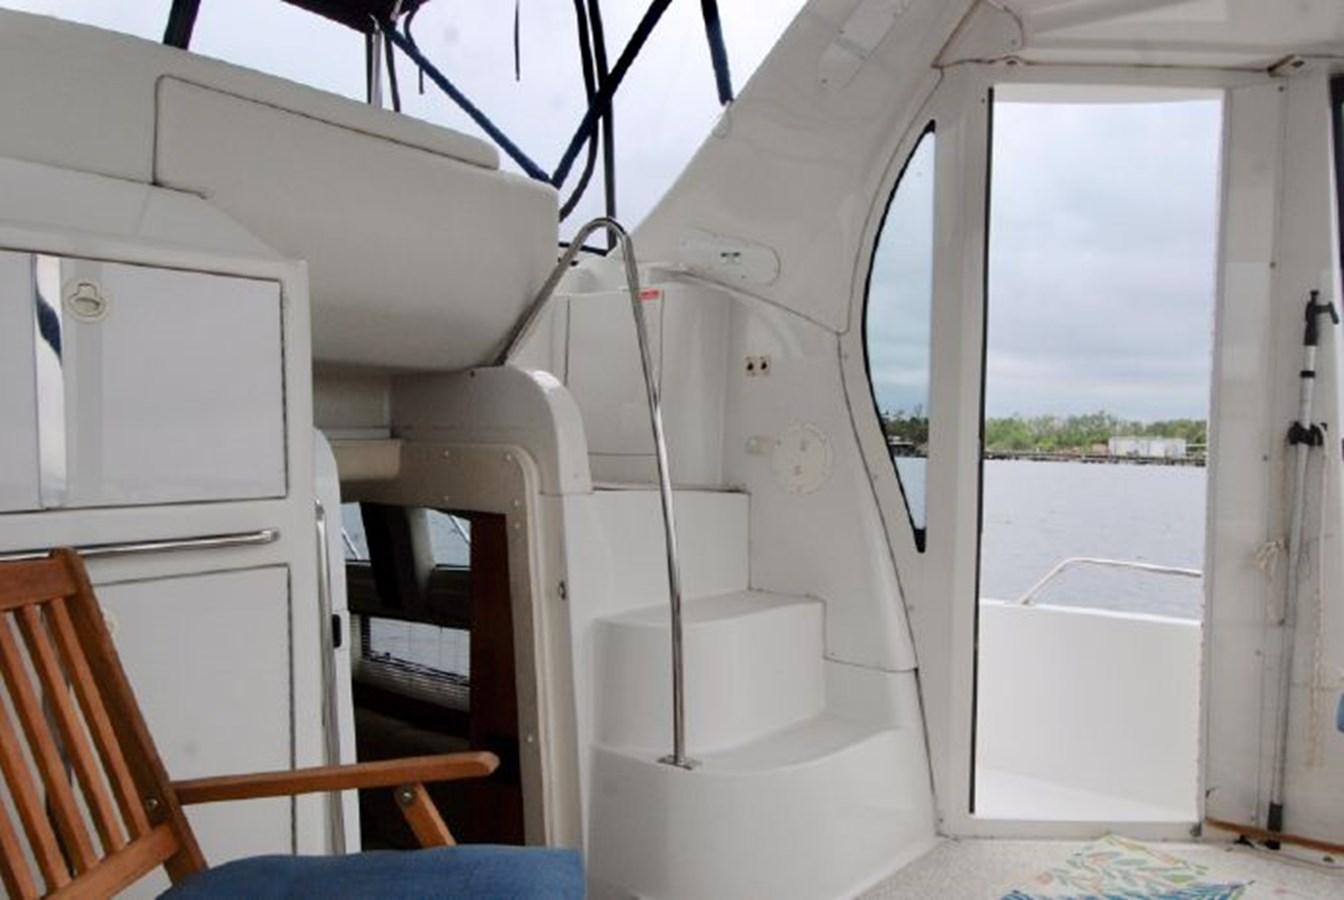 36 2001 CARVER 444 Cockpit Motor yacht Motor Yacht 2885812